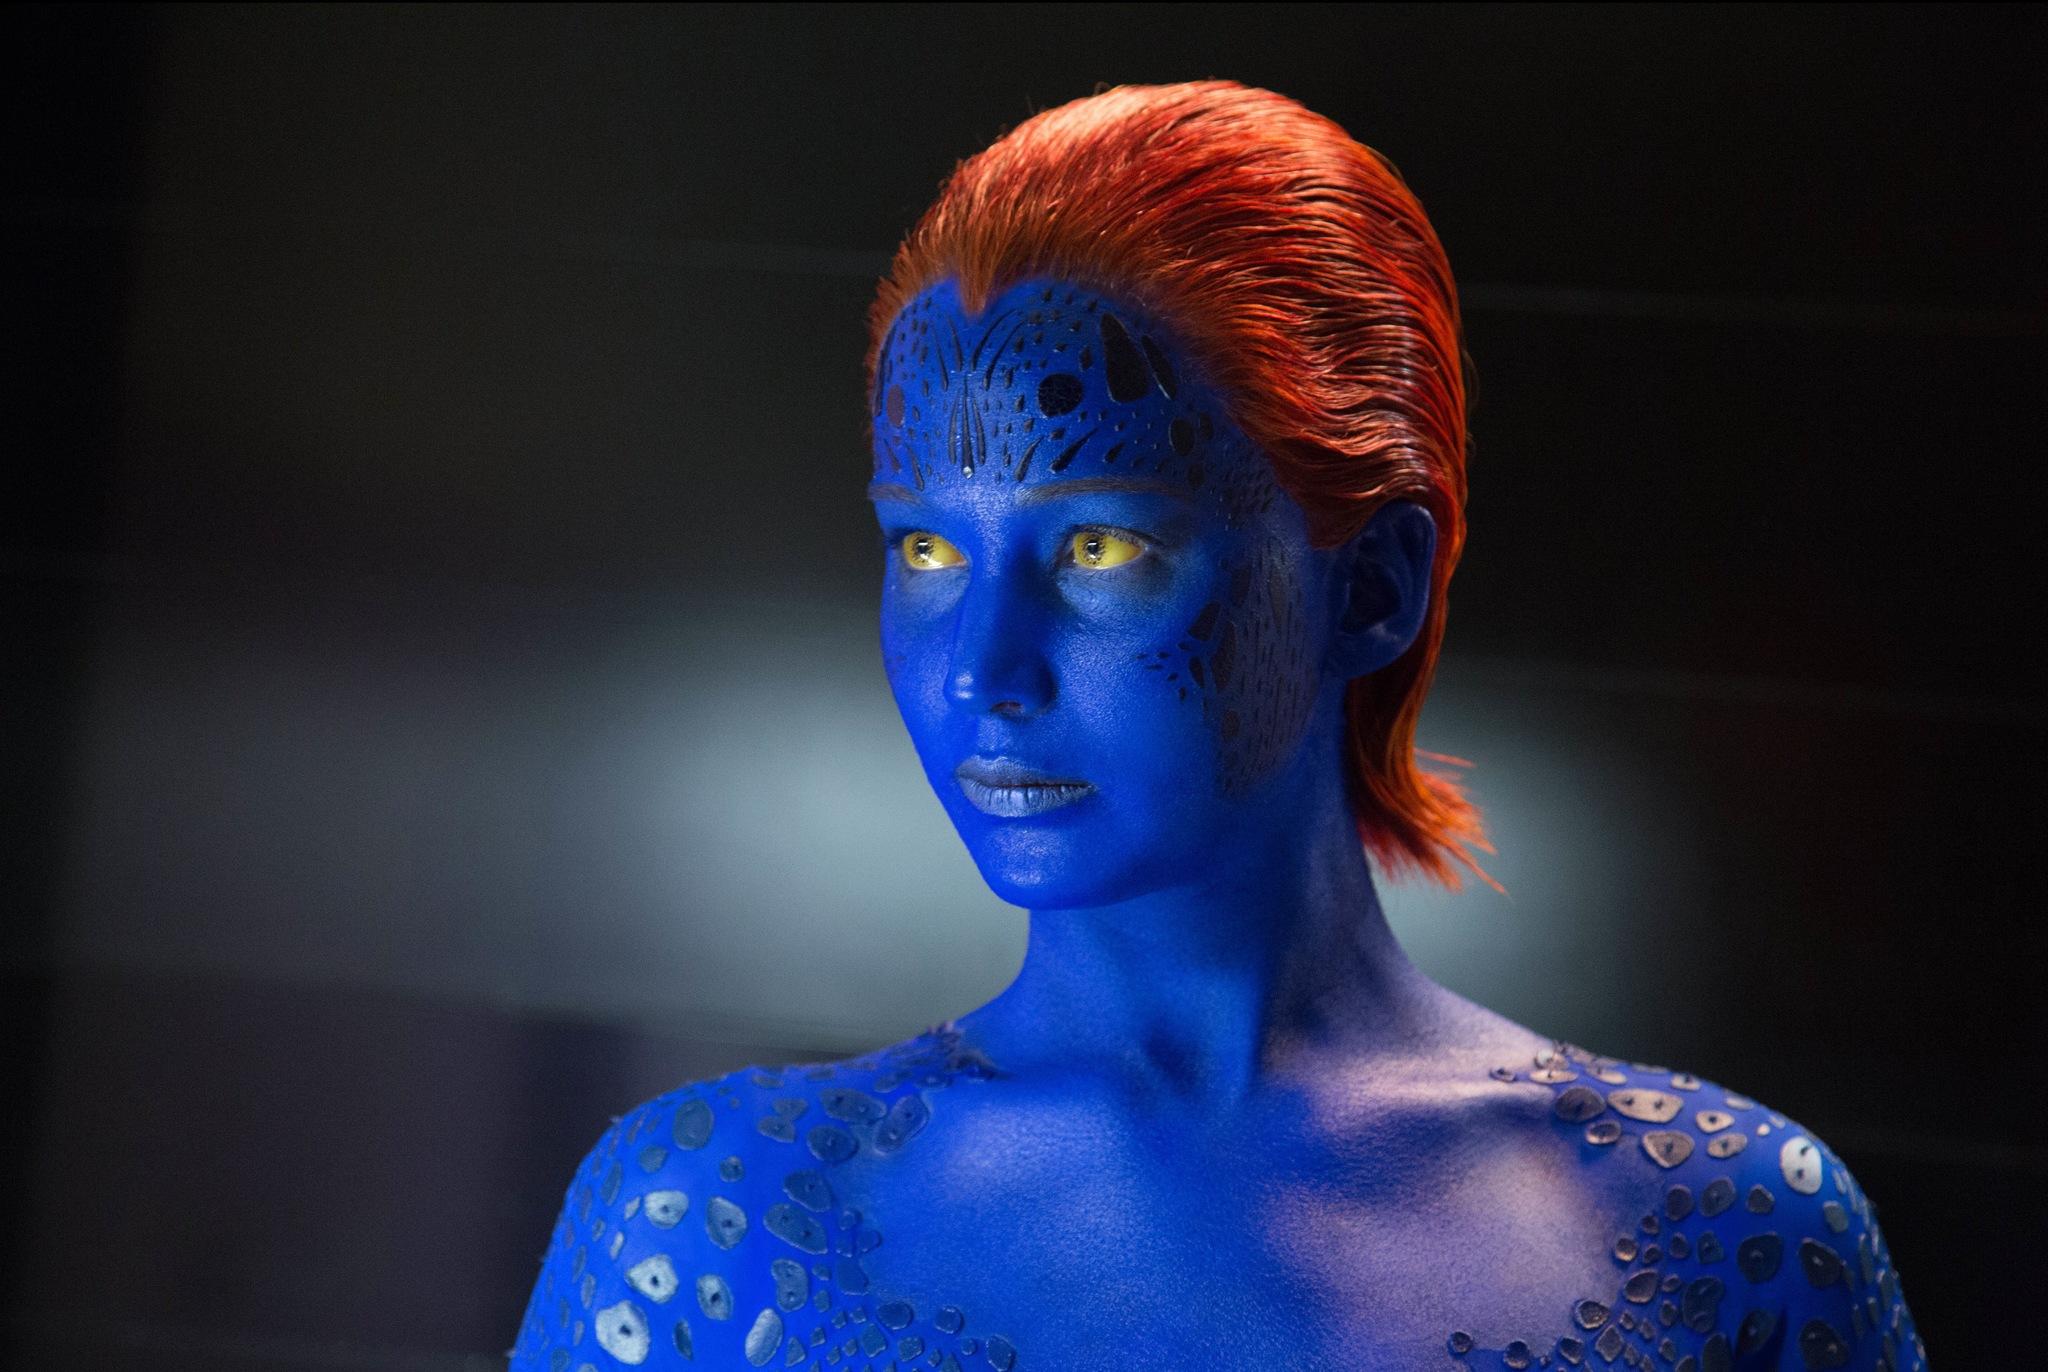 Jennifer Lawrence X-Men : Days of Future Past Promotional